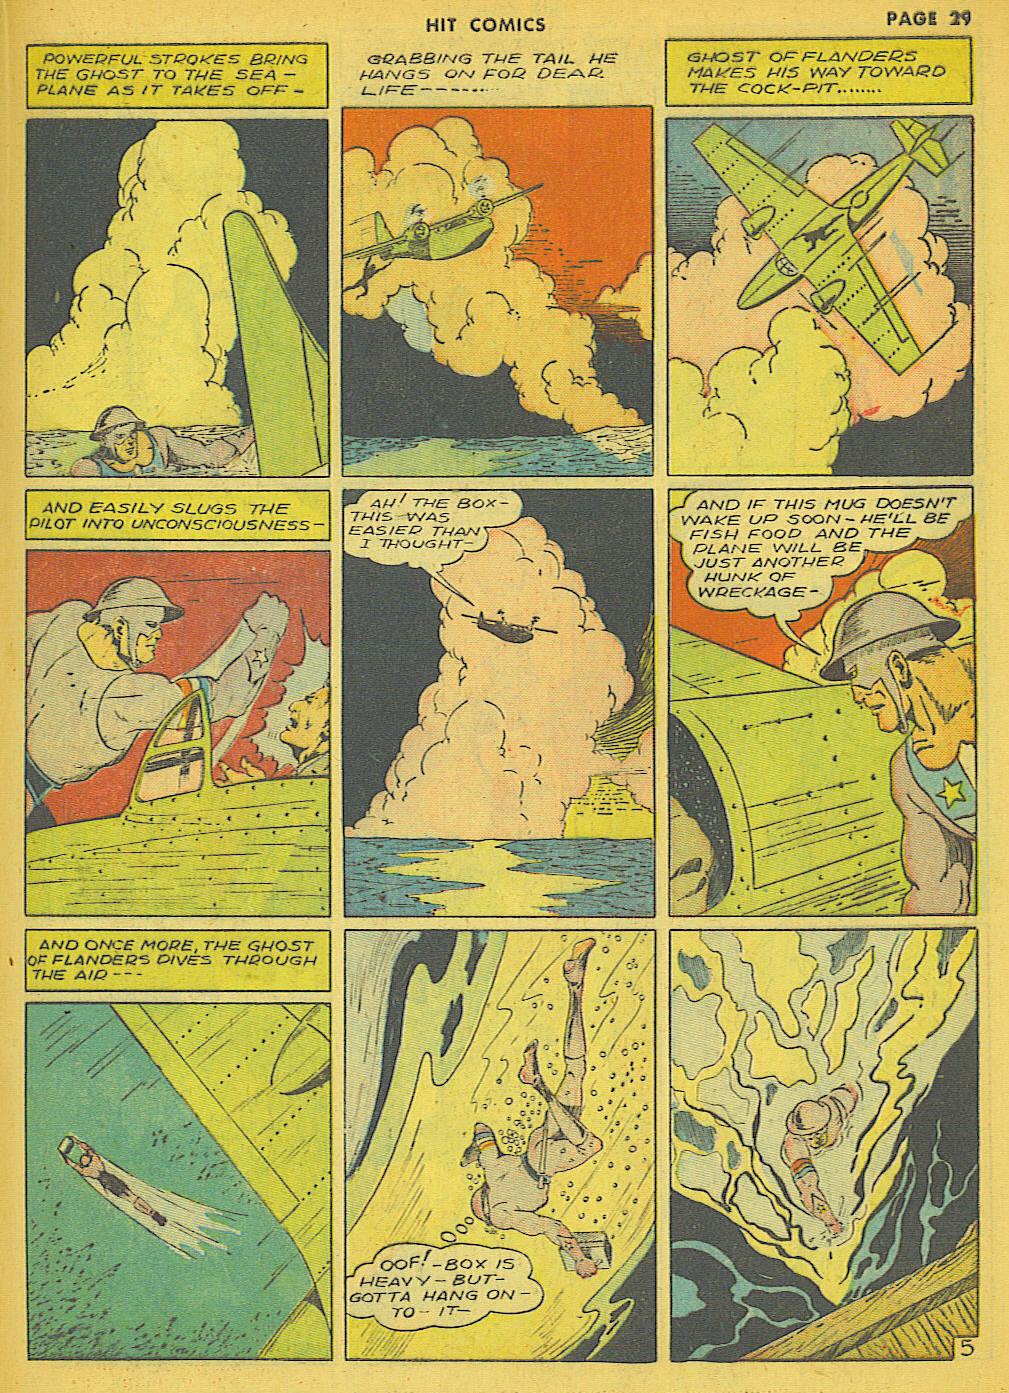 Read online Hit Comics comic -  Issue #21 - 31